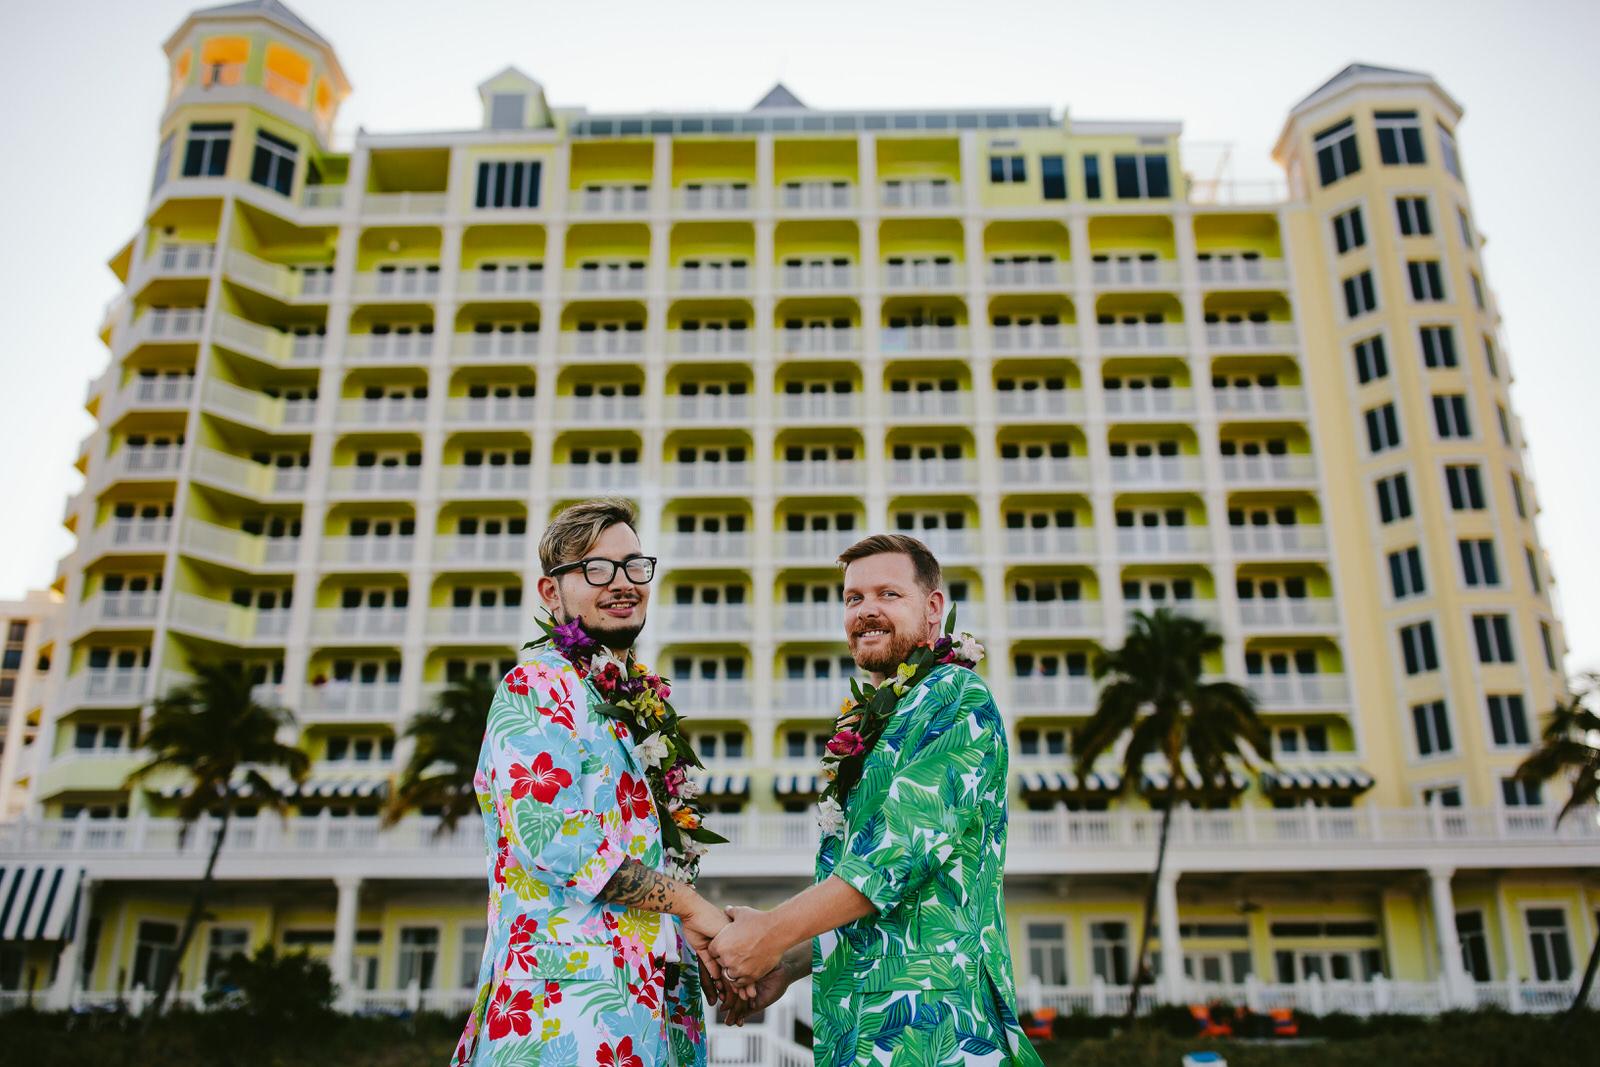 pelican-grand-elopement-portraits-tiny-house-photo-fort-lauderdale-lgbtq-wedding-photographer.jpg